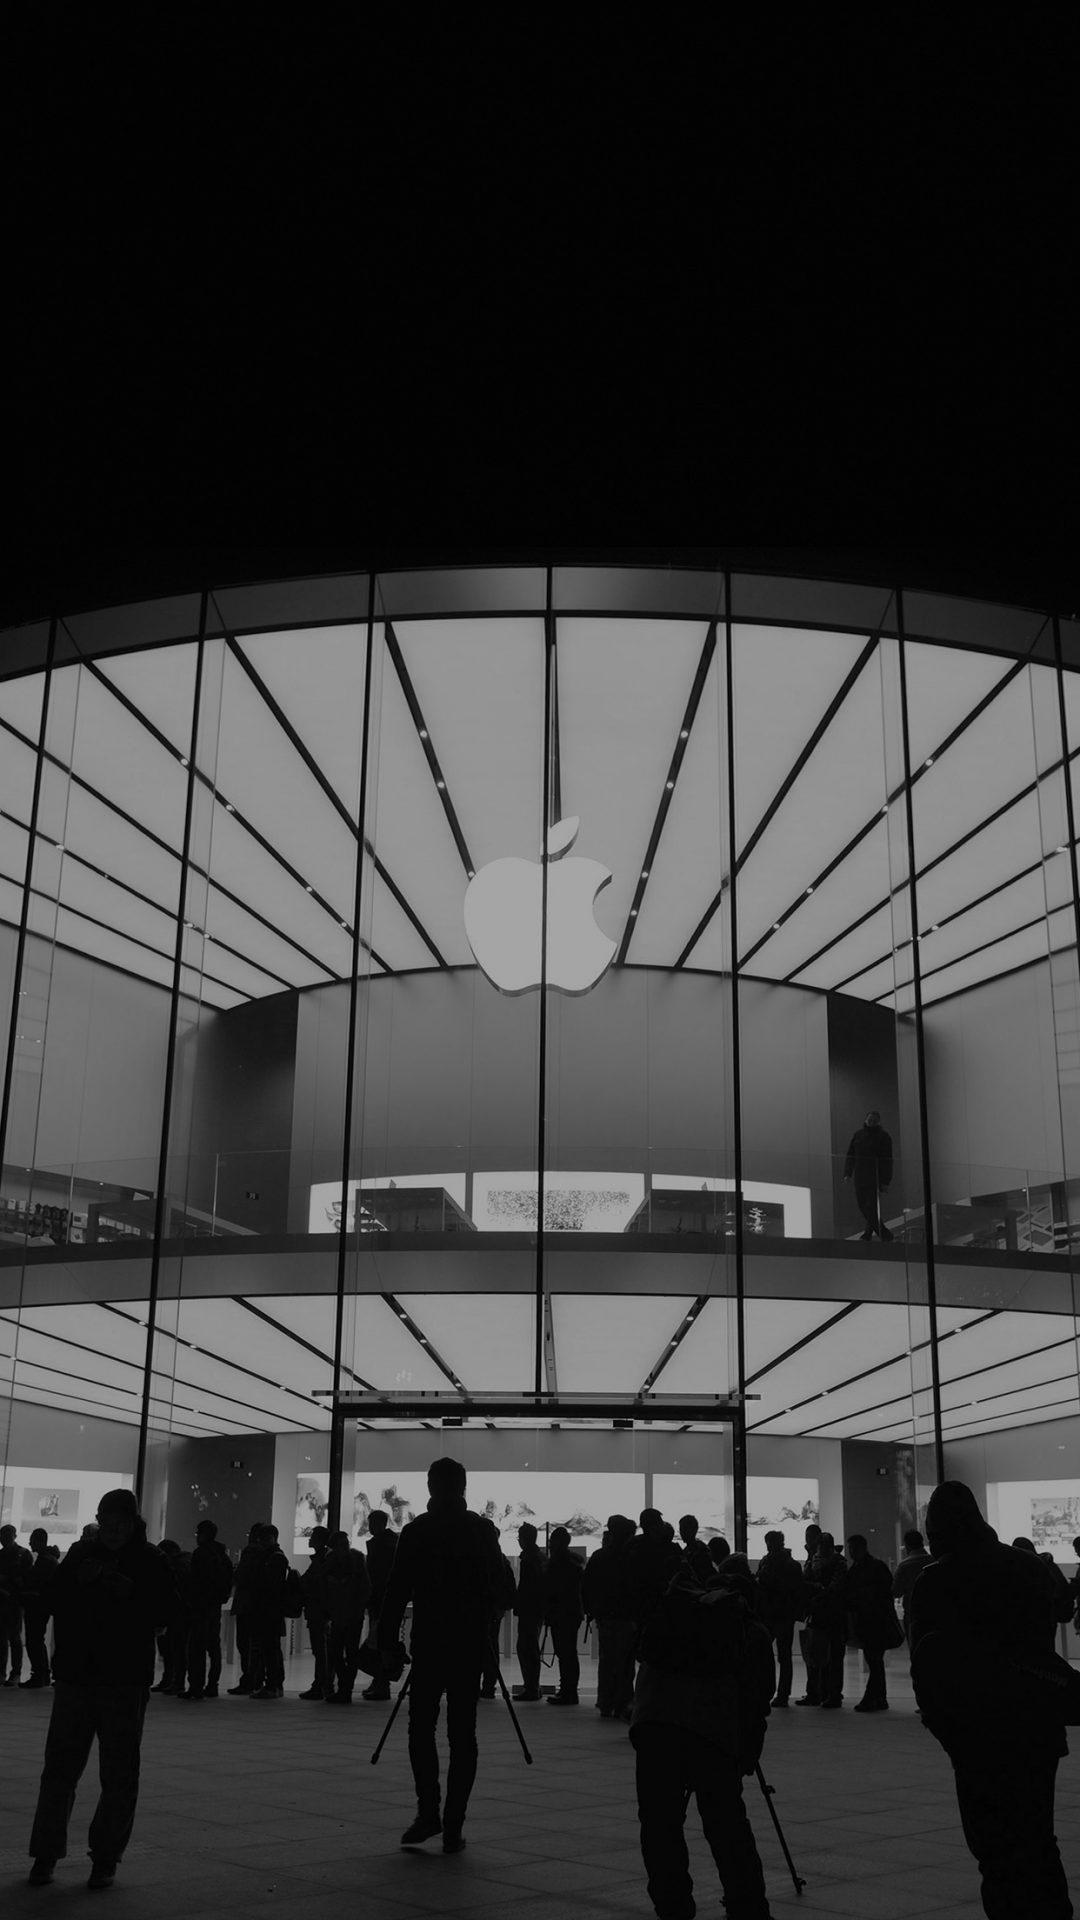 Apple Store Event City Architecture Dark